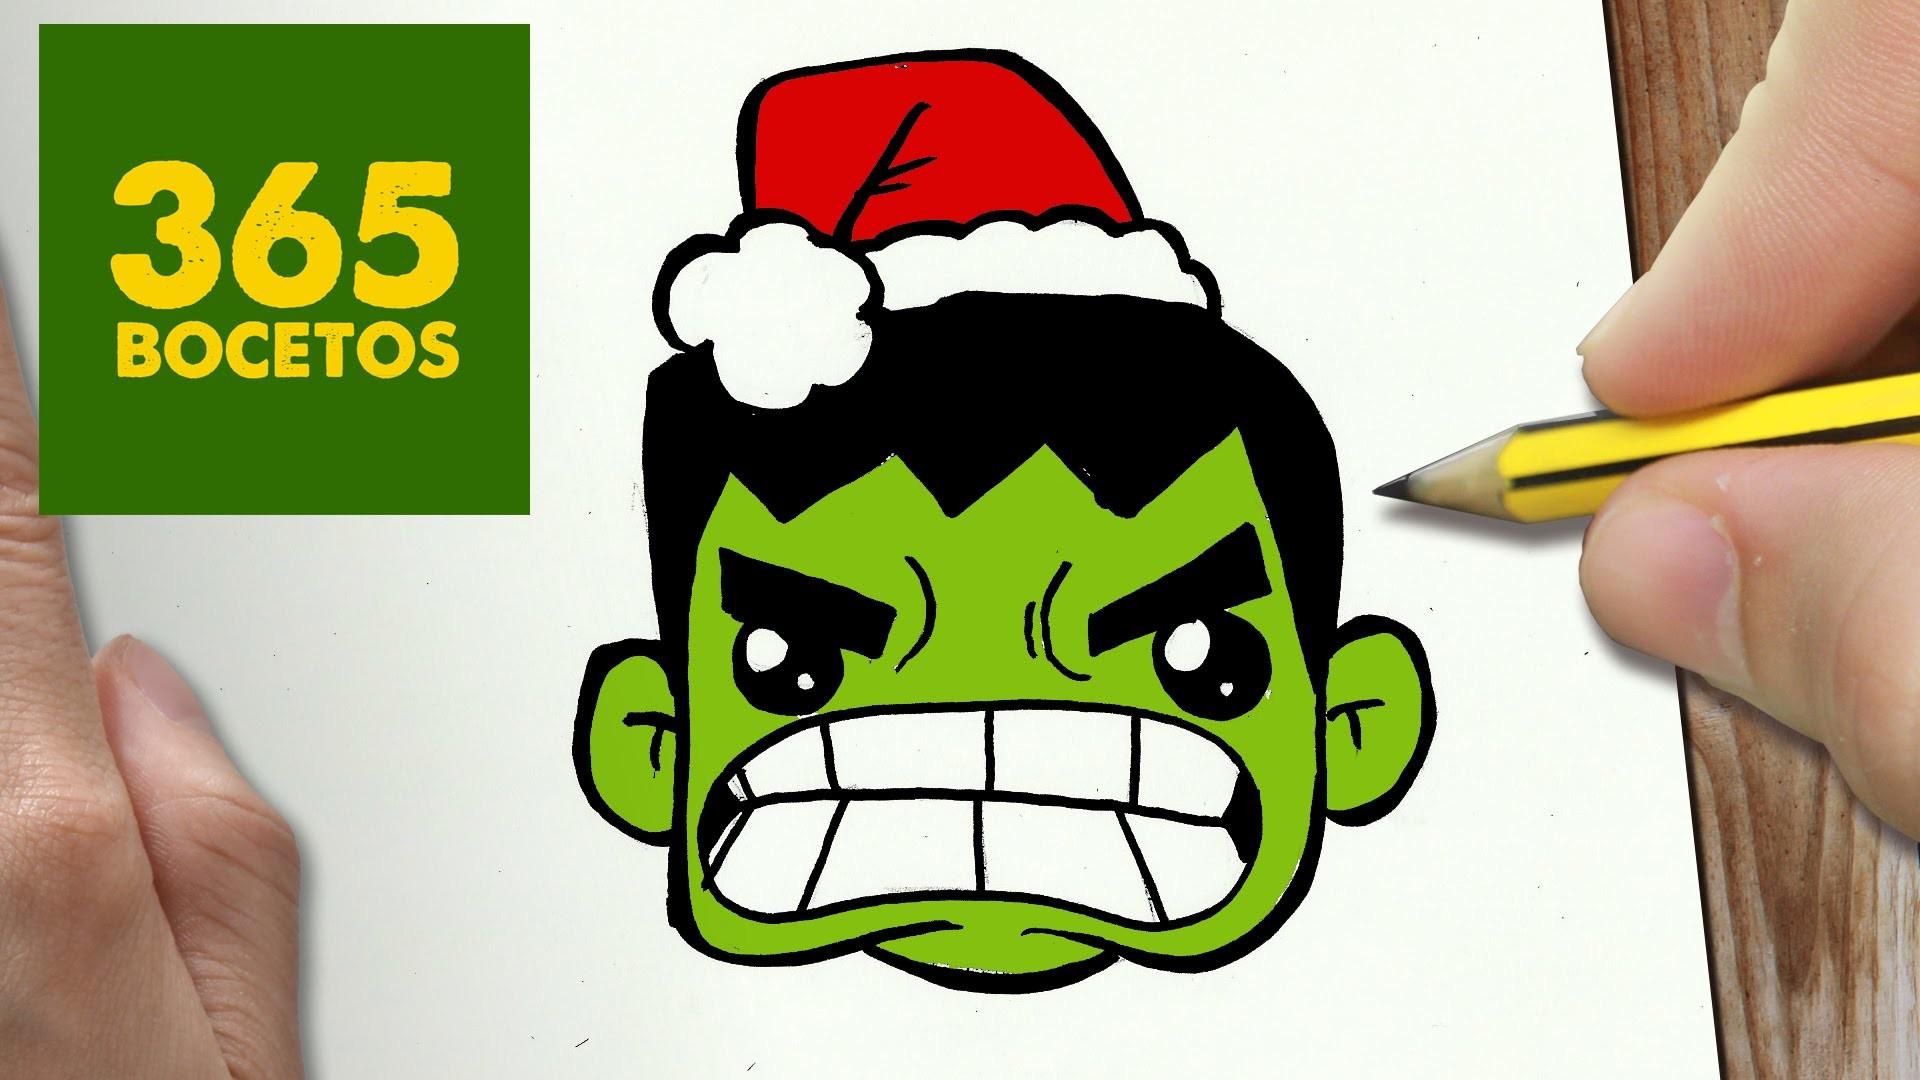 Como Dibujar Un Cuaderno Para Navidad Paso A Paso Dibujos: COMO DIBUJAR UN HULK PARA NAVIDAD PASO A PASO: Dibujos